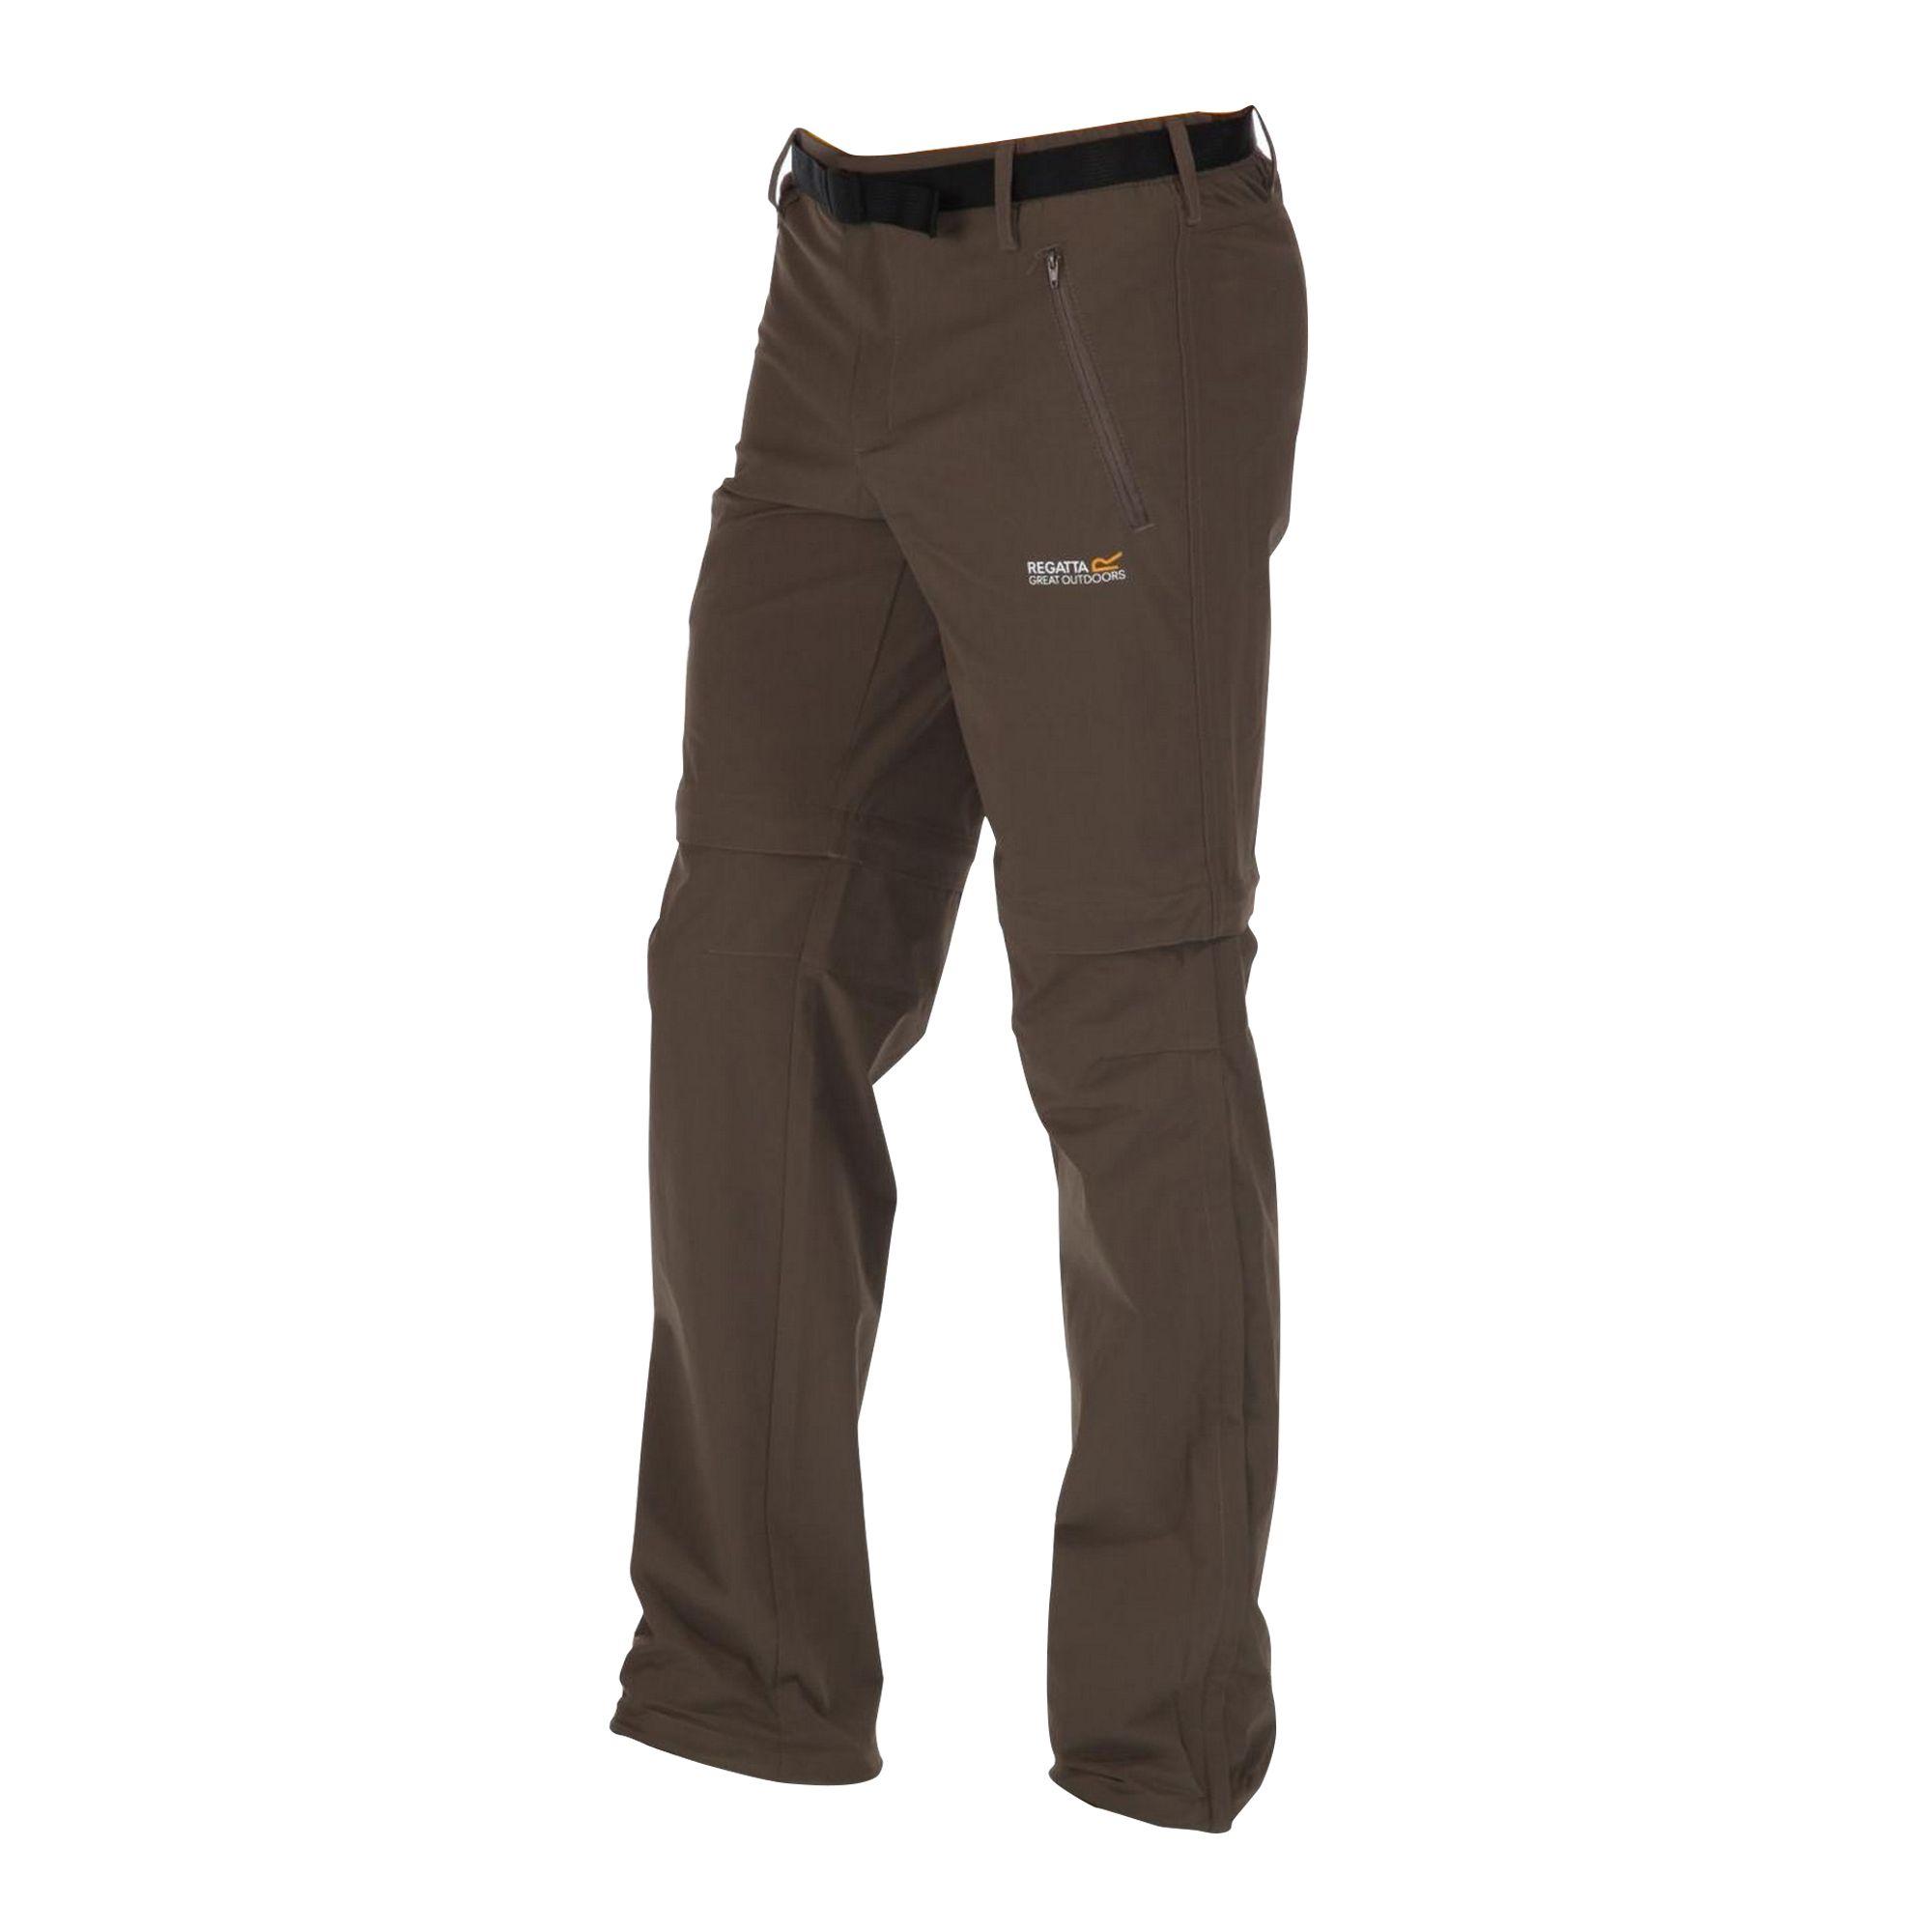 Regatta Great Outdoors Mens Xert Stretch Zip Off Trousers II